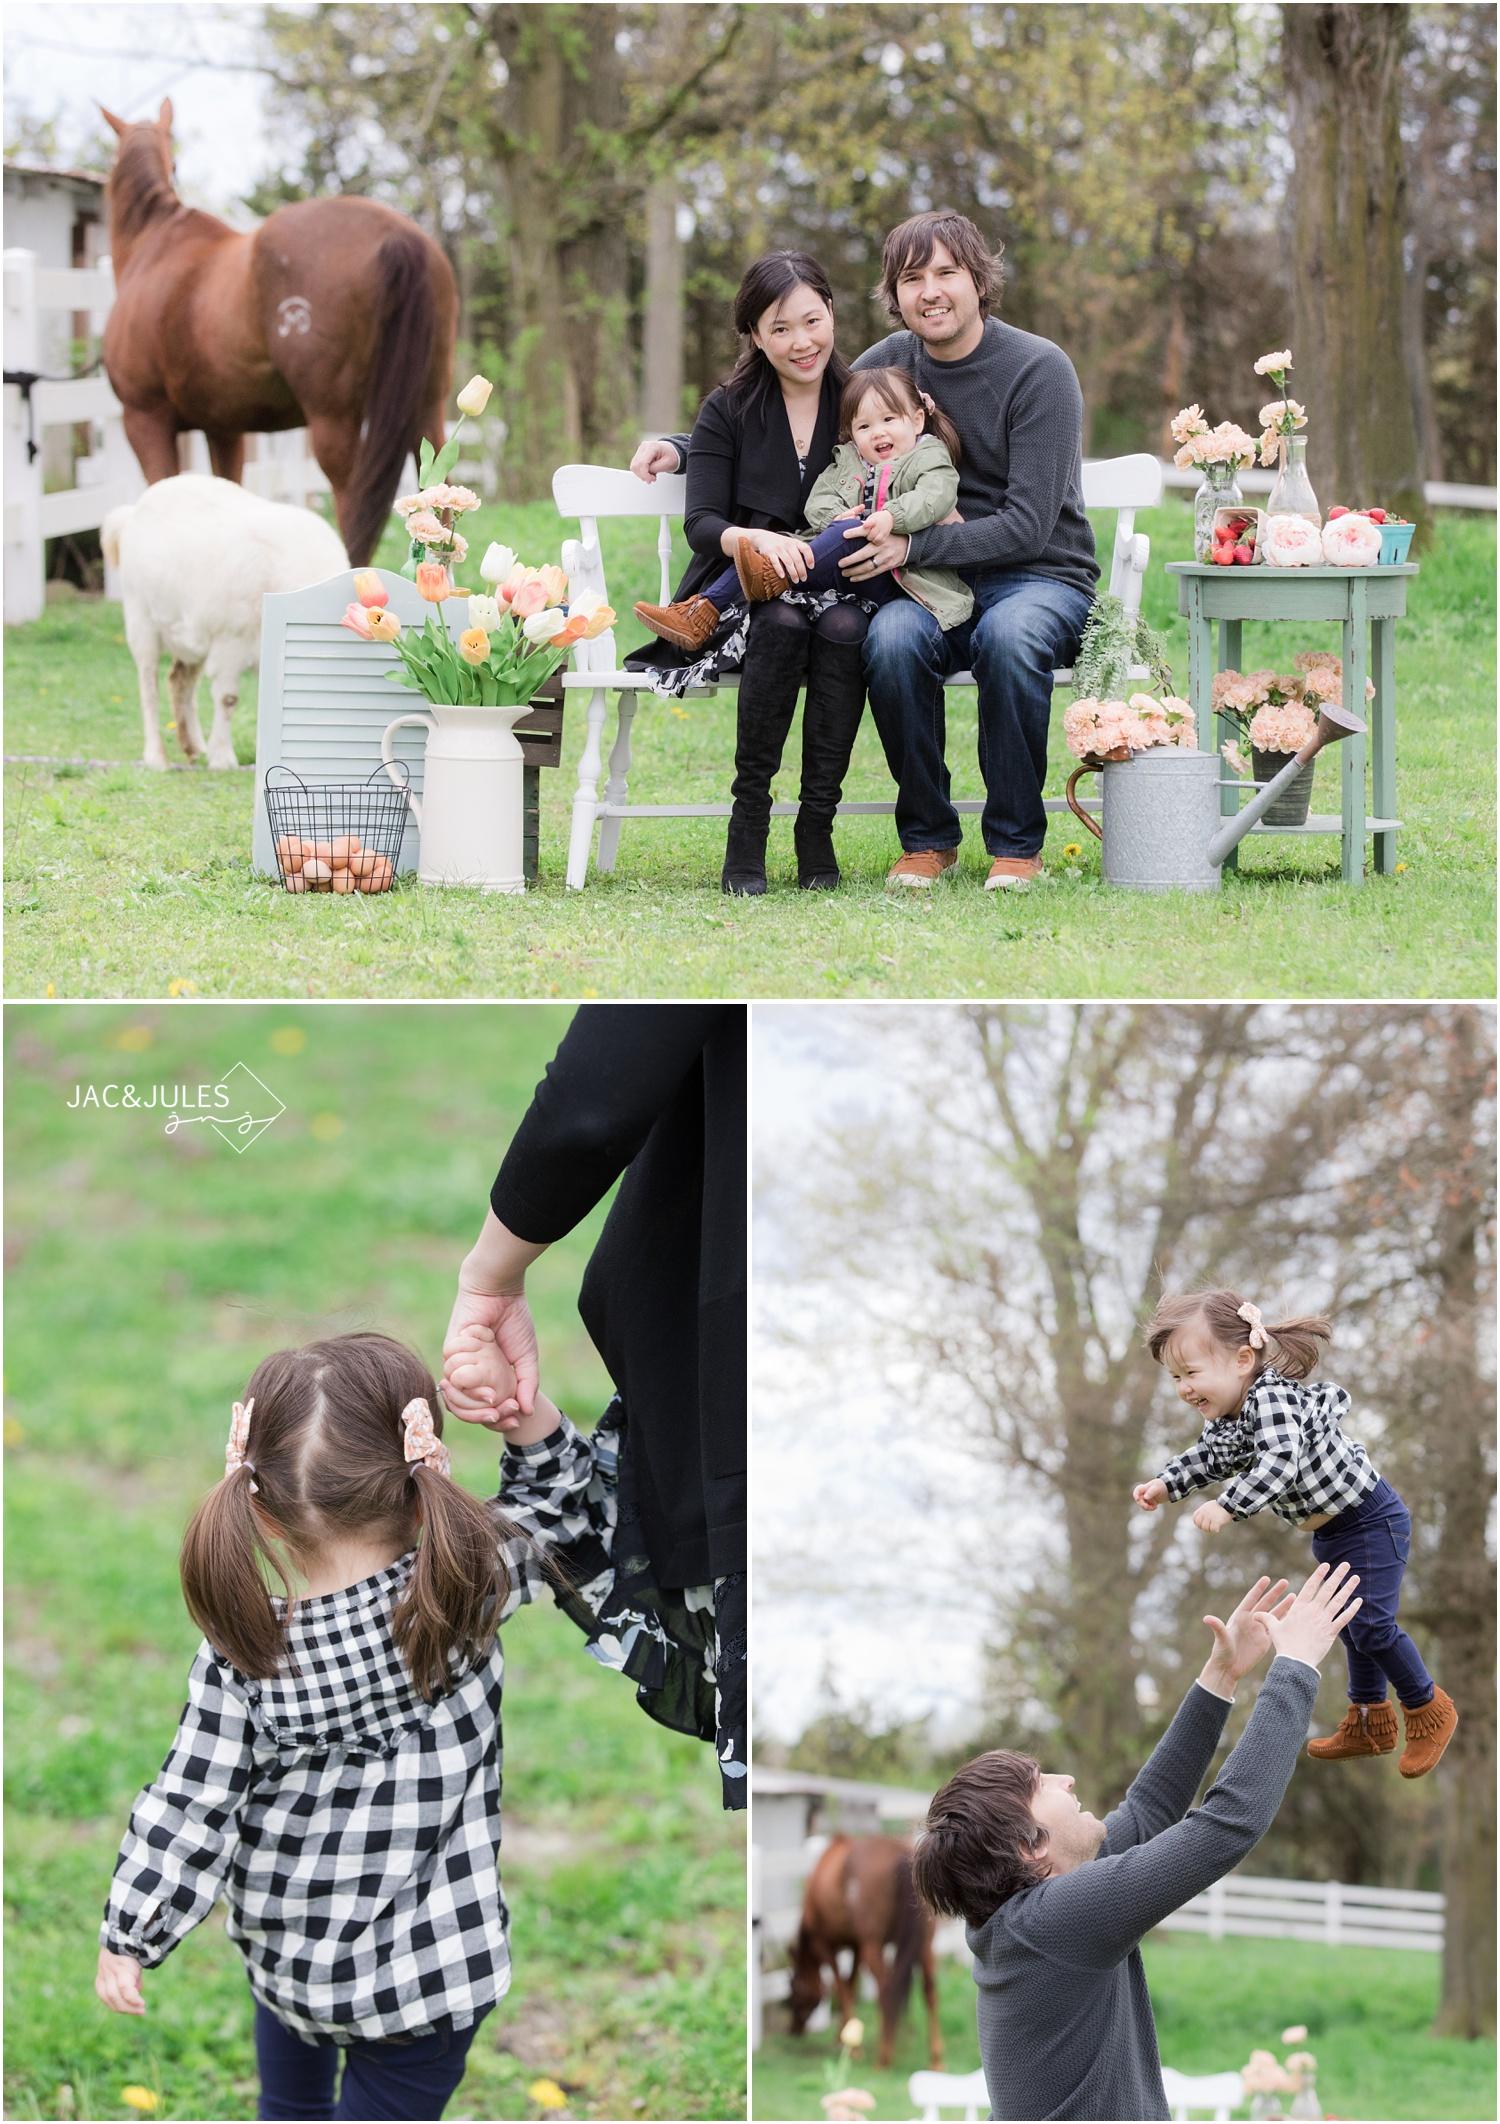 playful family photos at the horse farm in nj